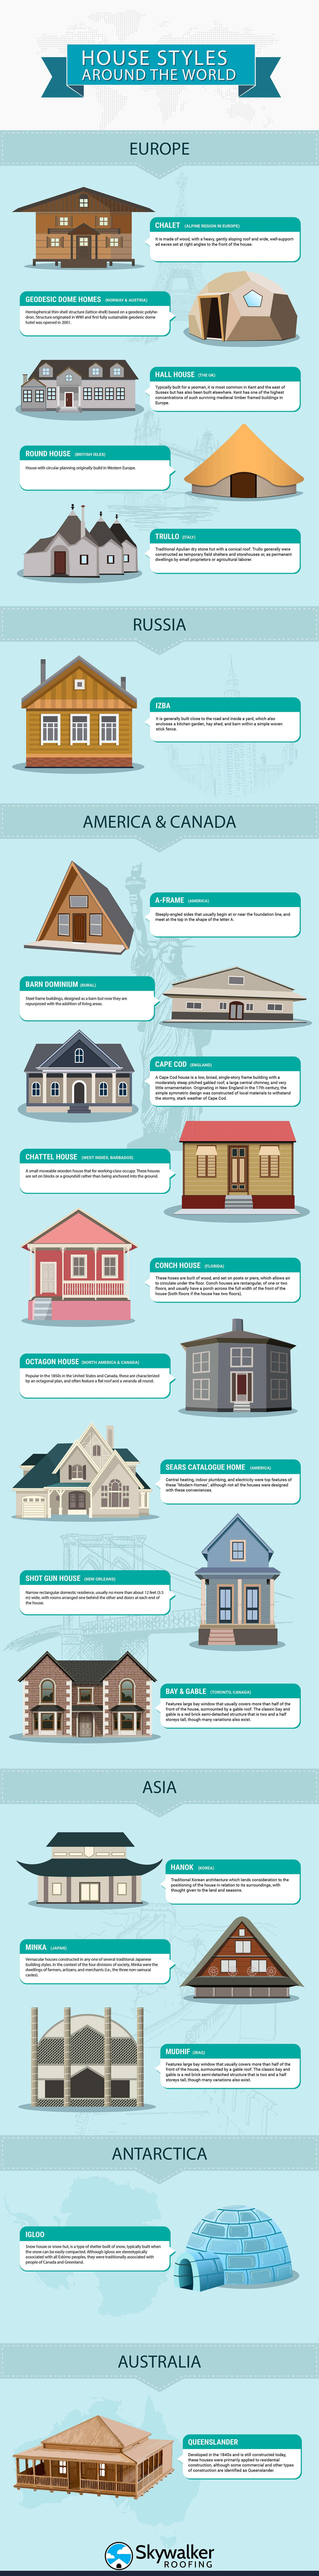 house-styles-around-the-world-infographic-plaza